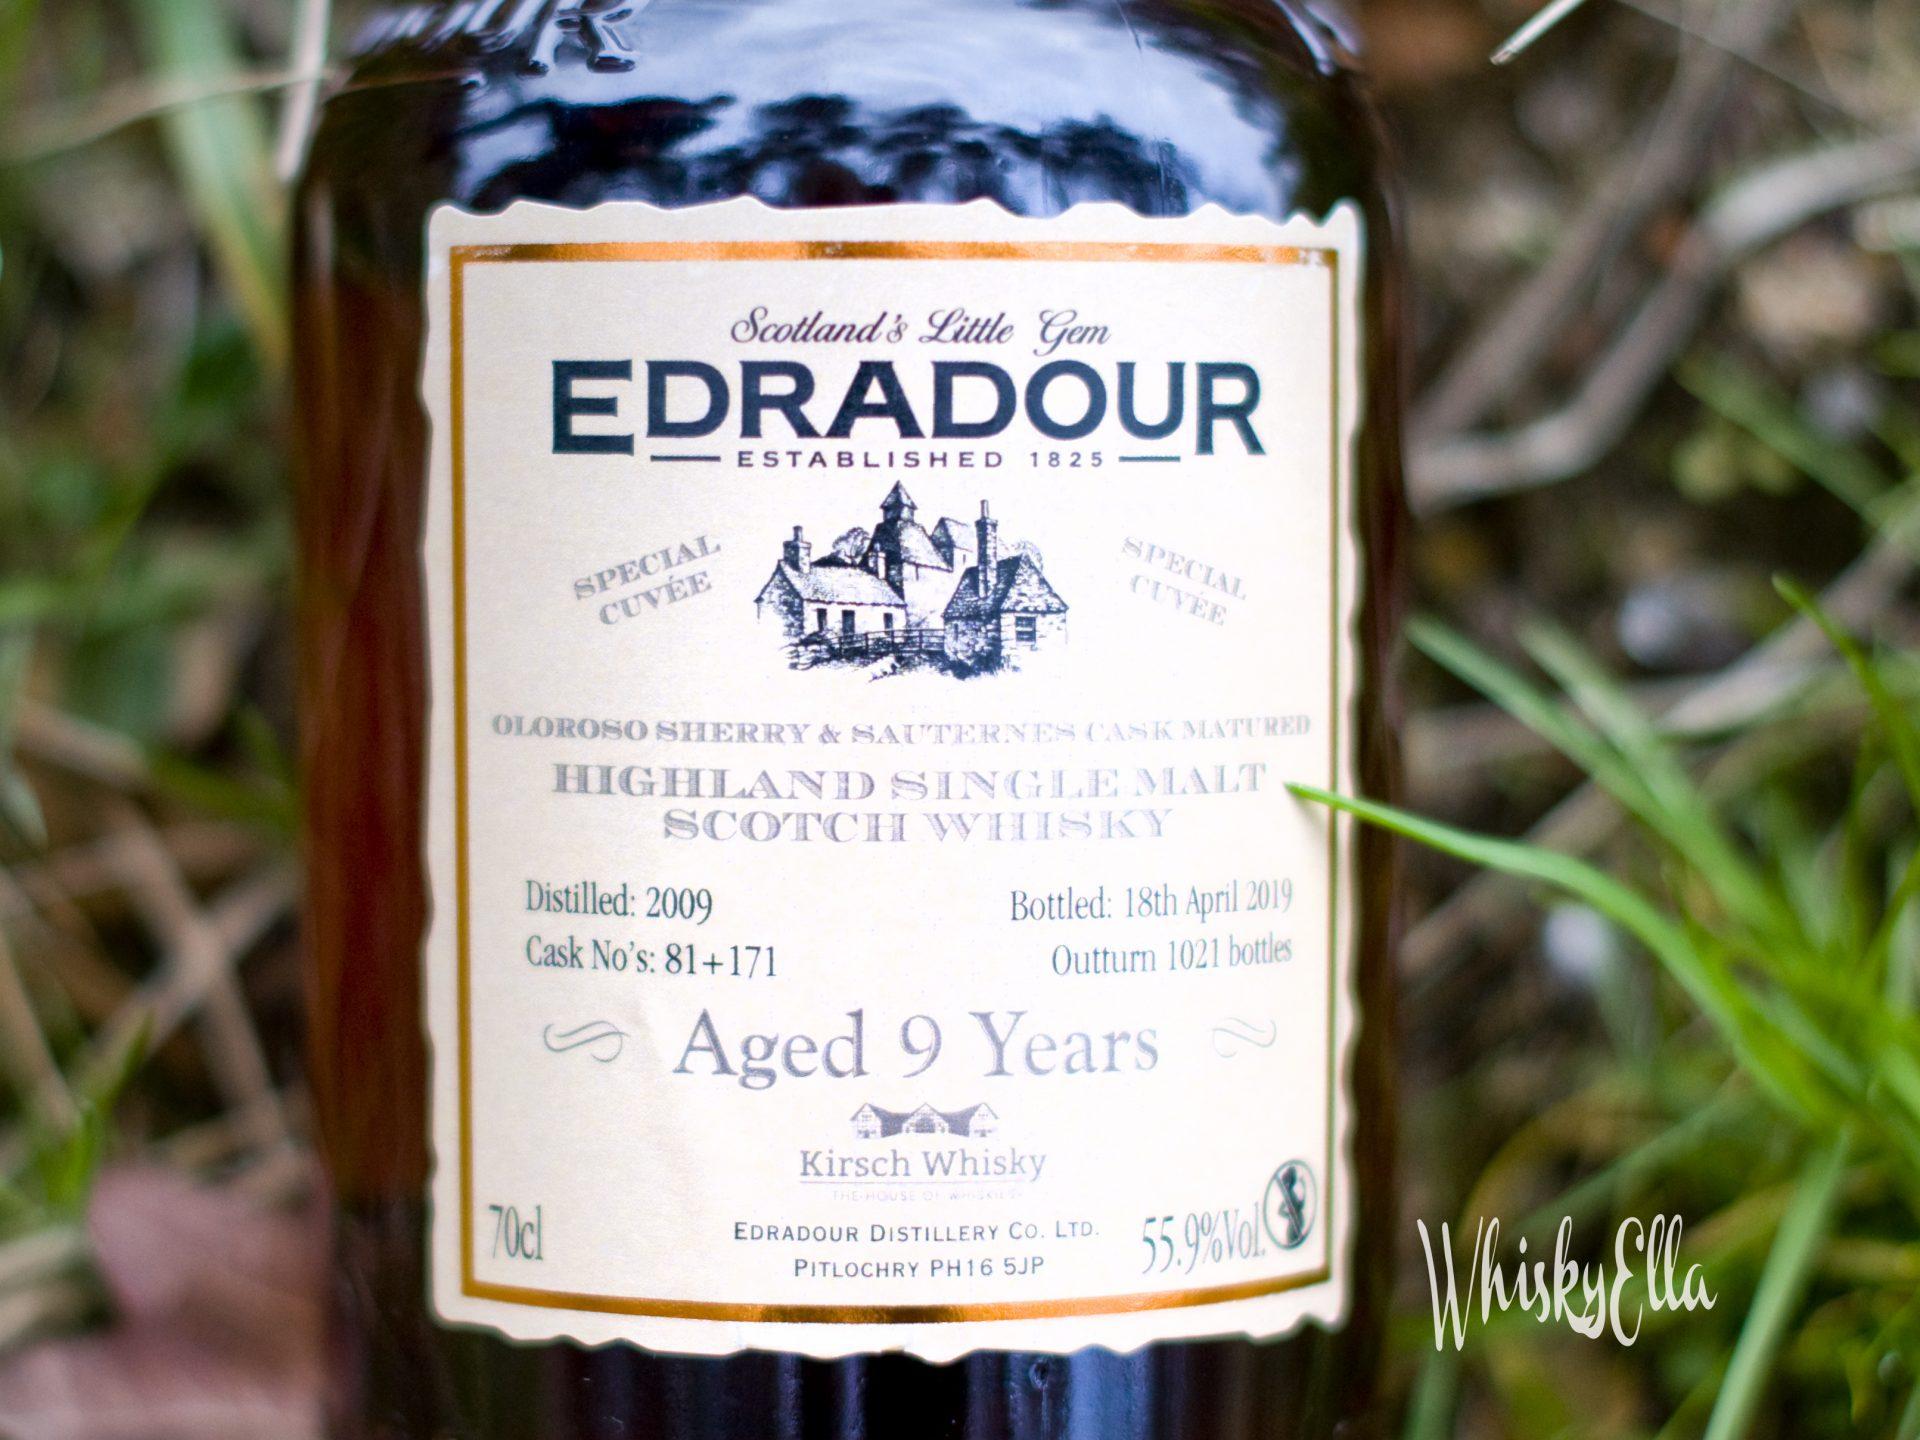 Nasza recenzja Edradour 9 yo Oloroso Sherry & Sauternes Cask Matured #61